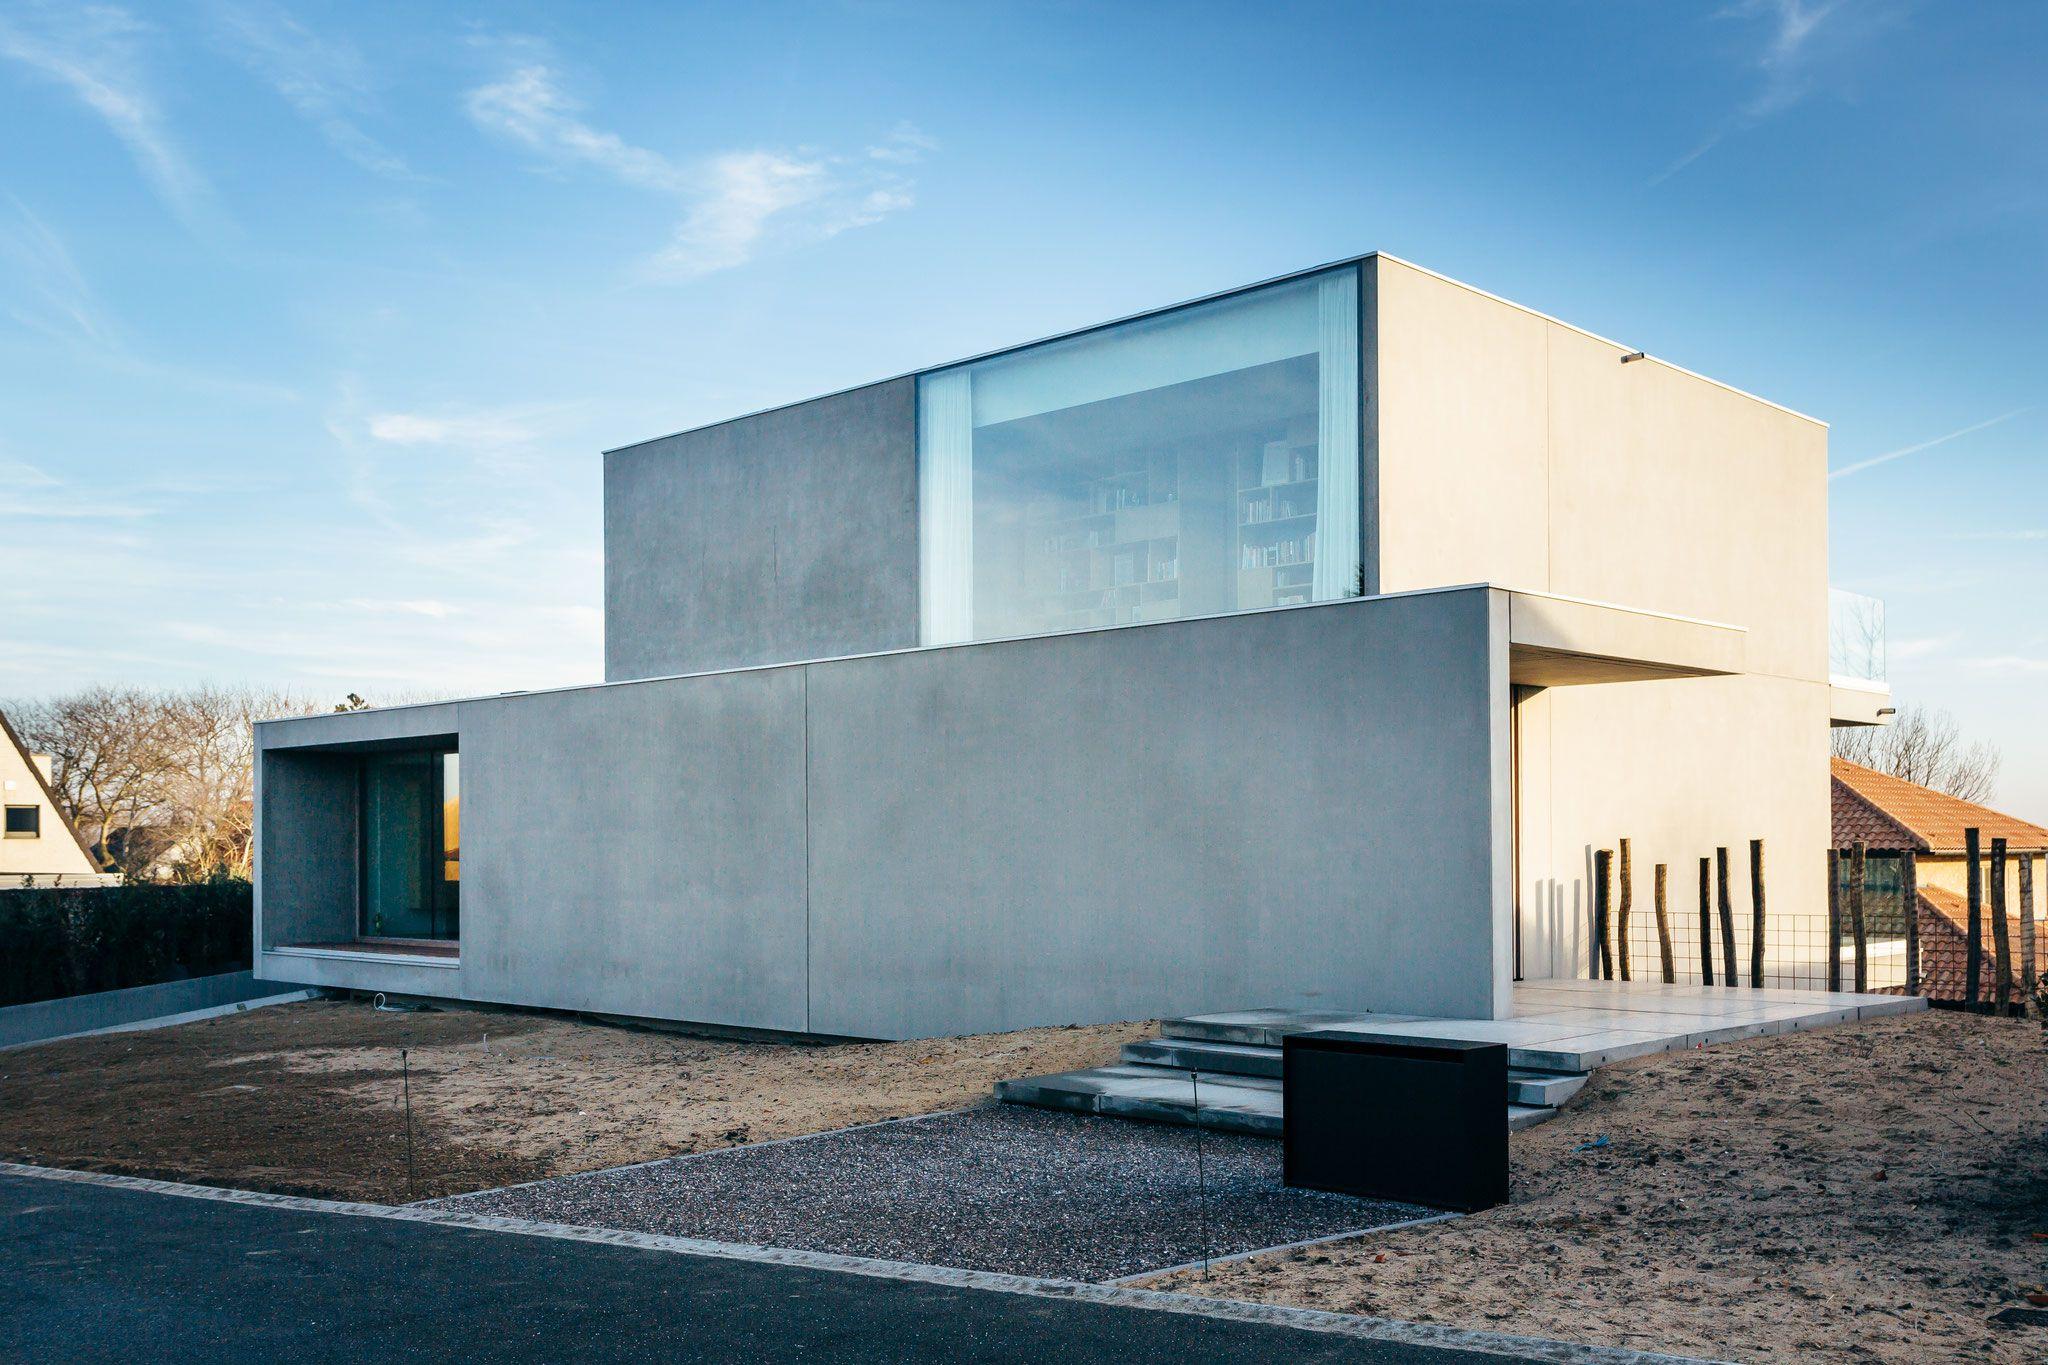 Snel huizen bouw modulair bouwen prefab beton huizen for Moderne bouw